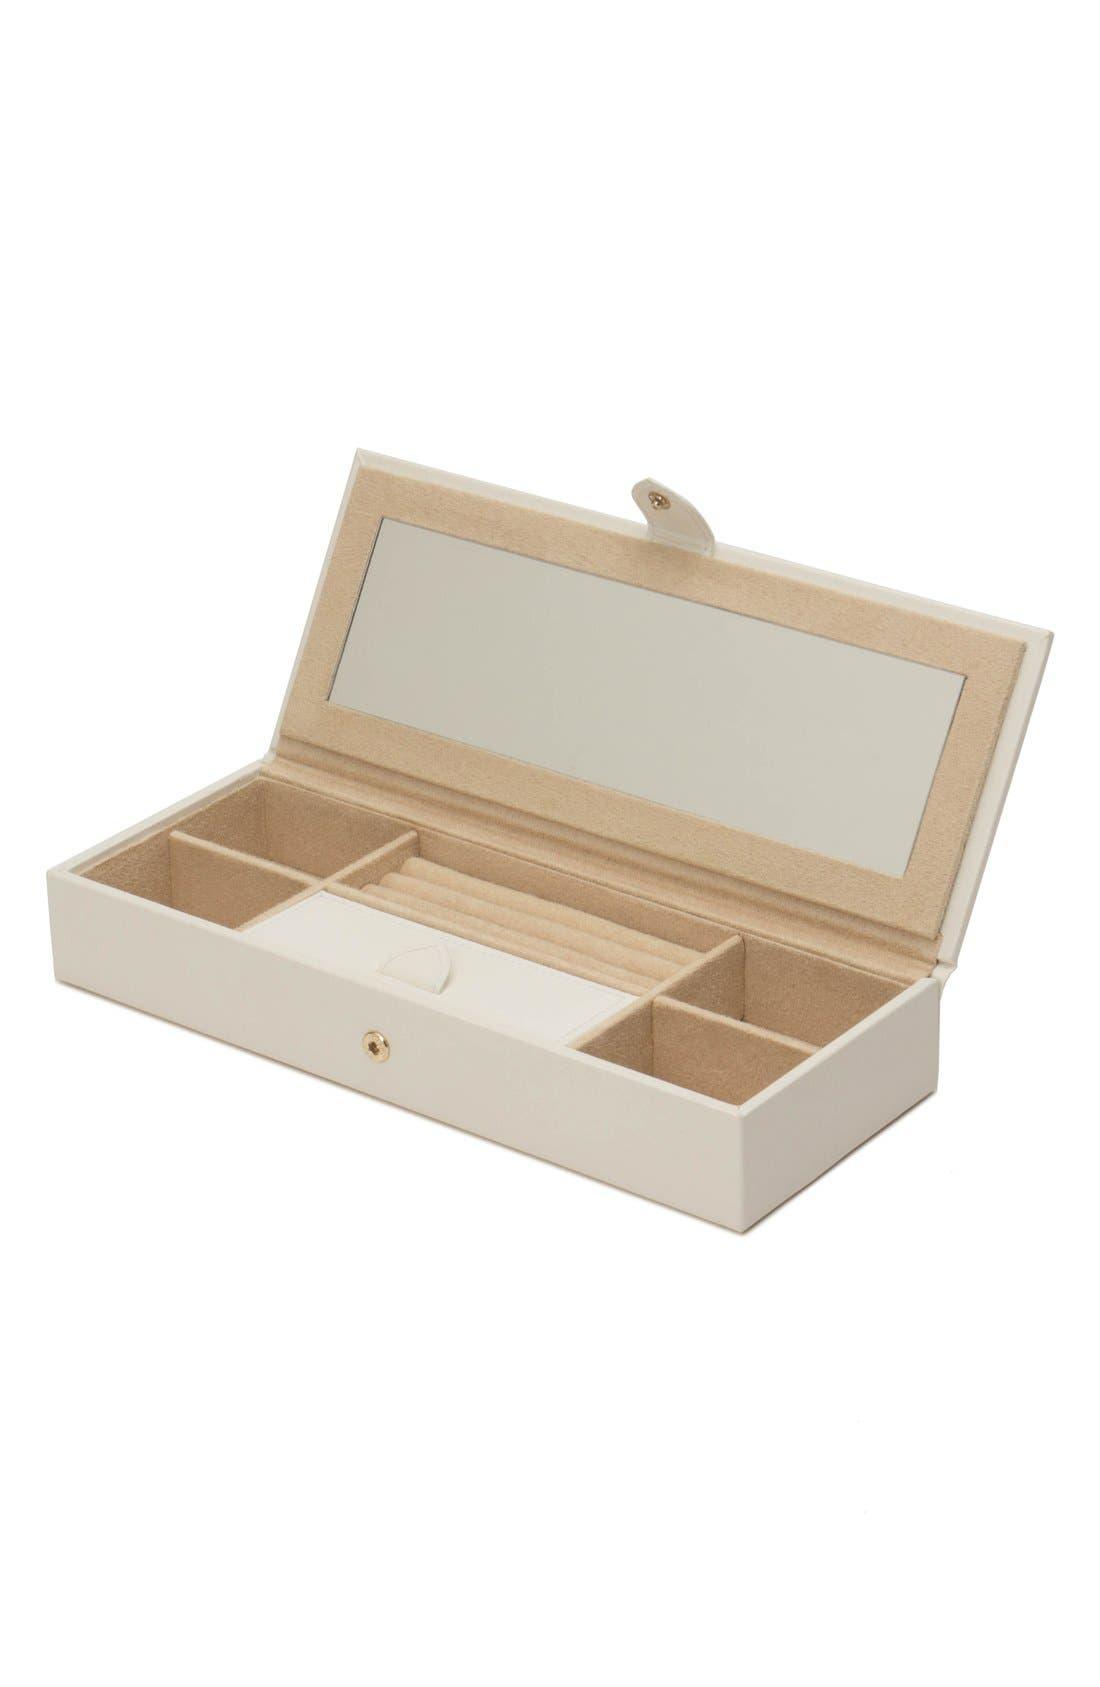 'Marrakesh' Jewelry Box,                             Alternate thumbnail 2, color,                             Cream